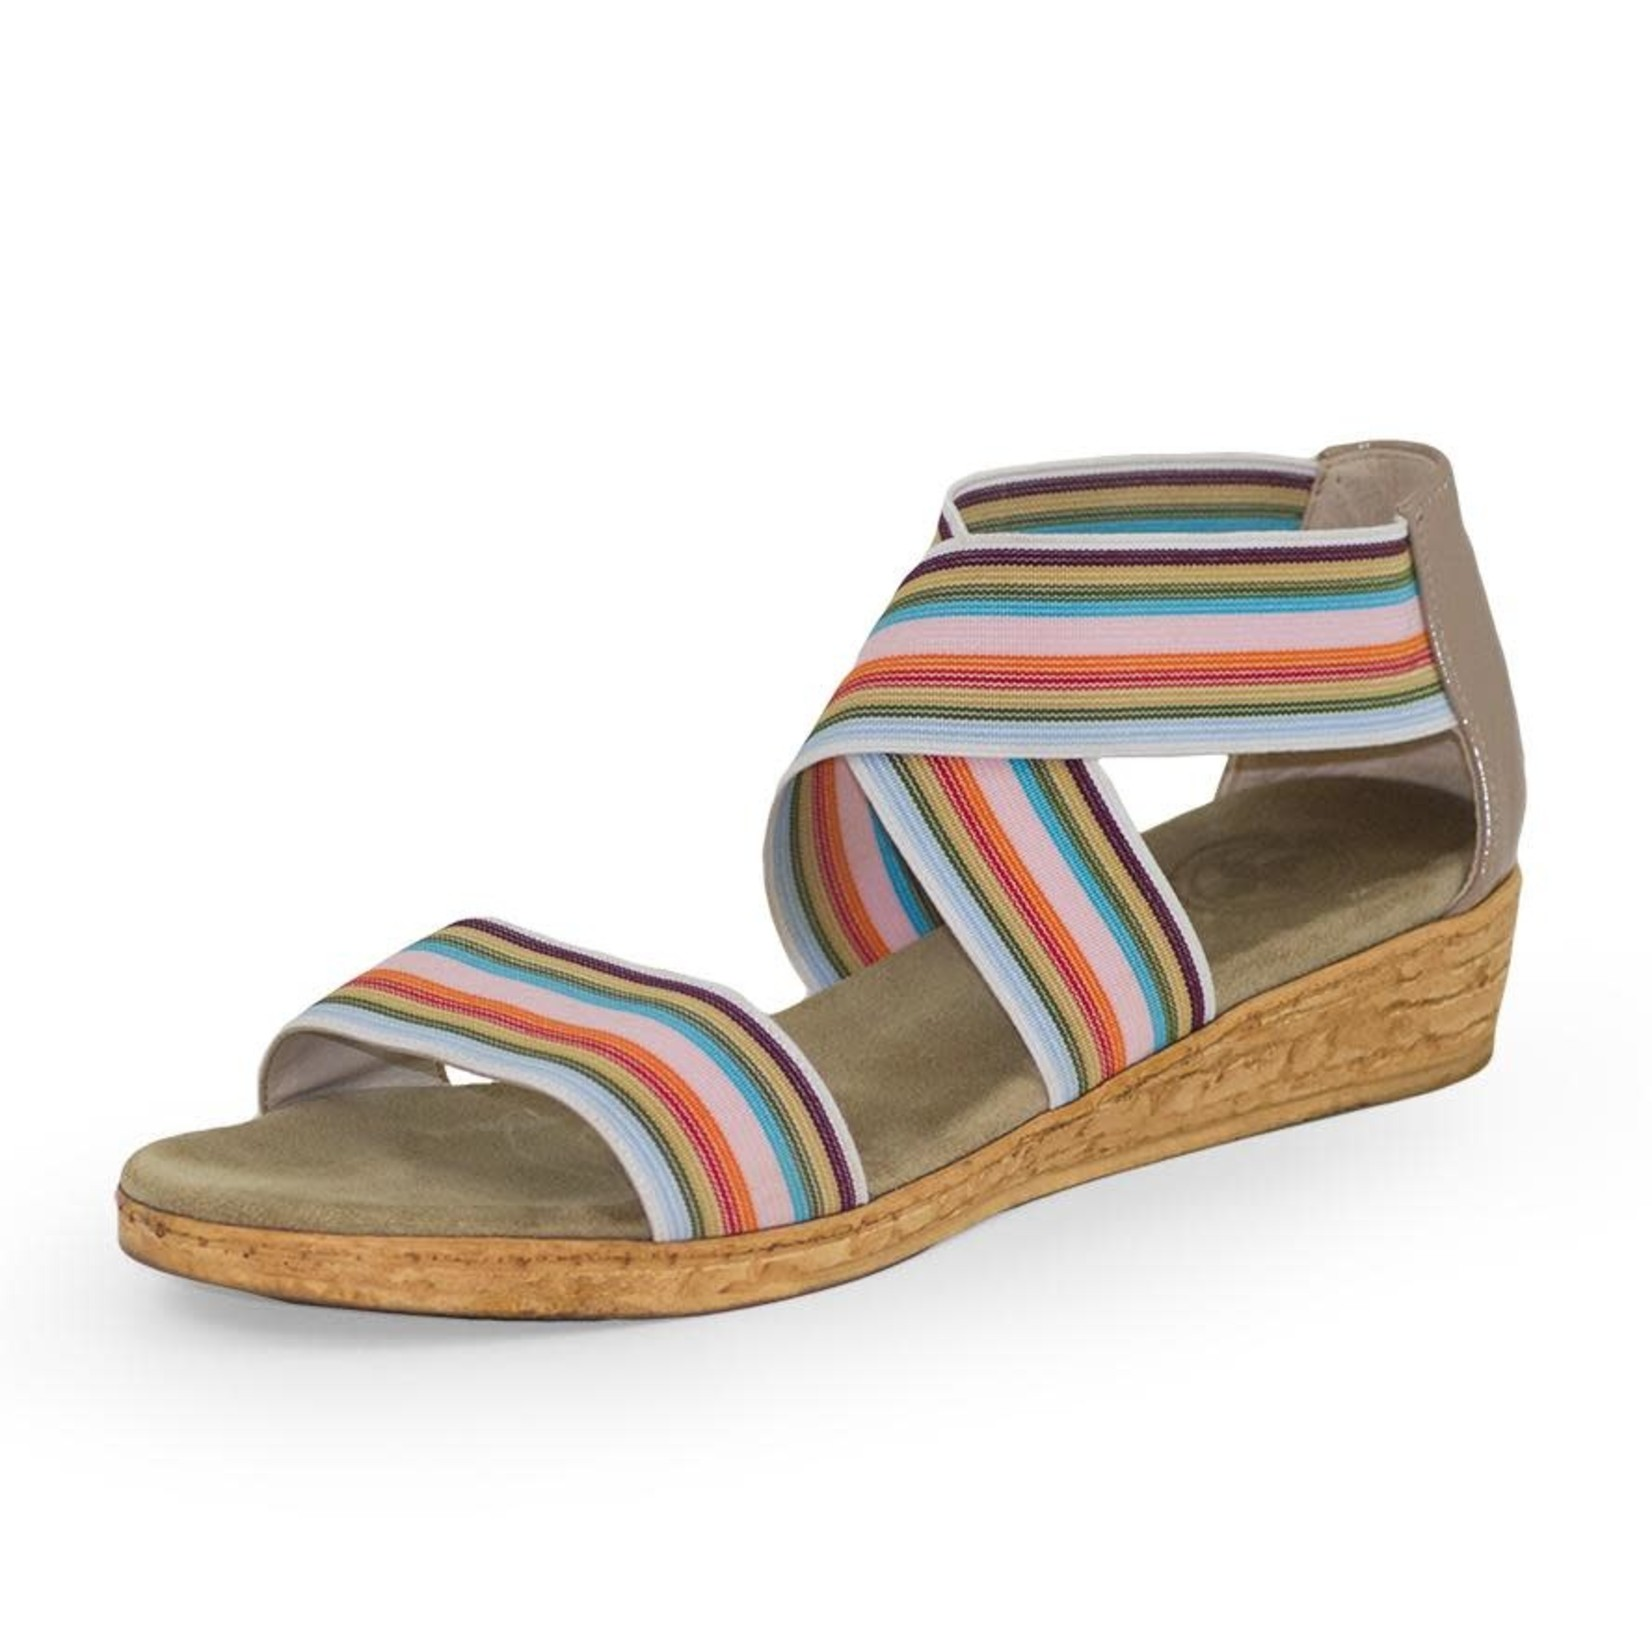 Peri Shoe in Multi StrIpe 9